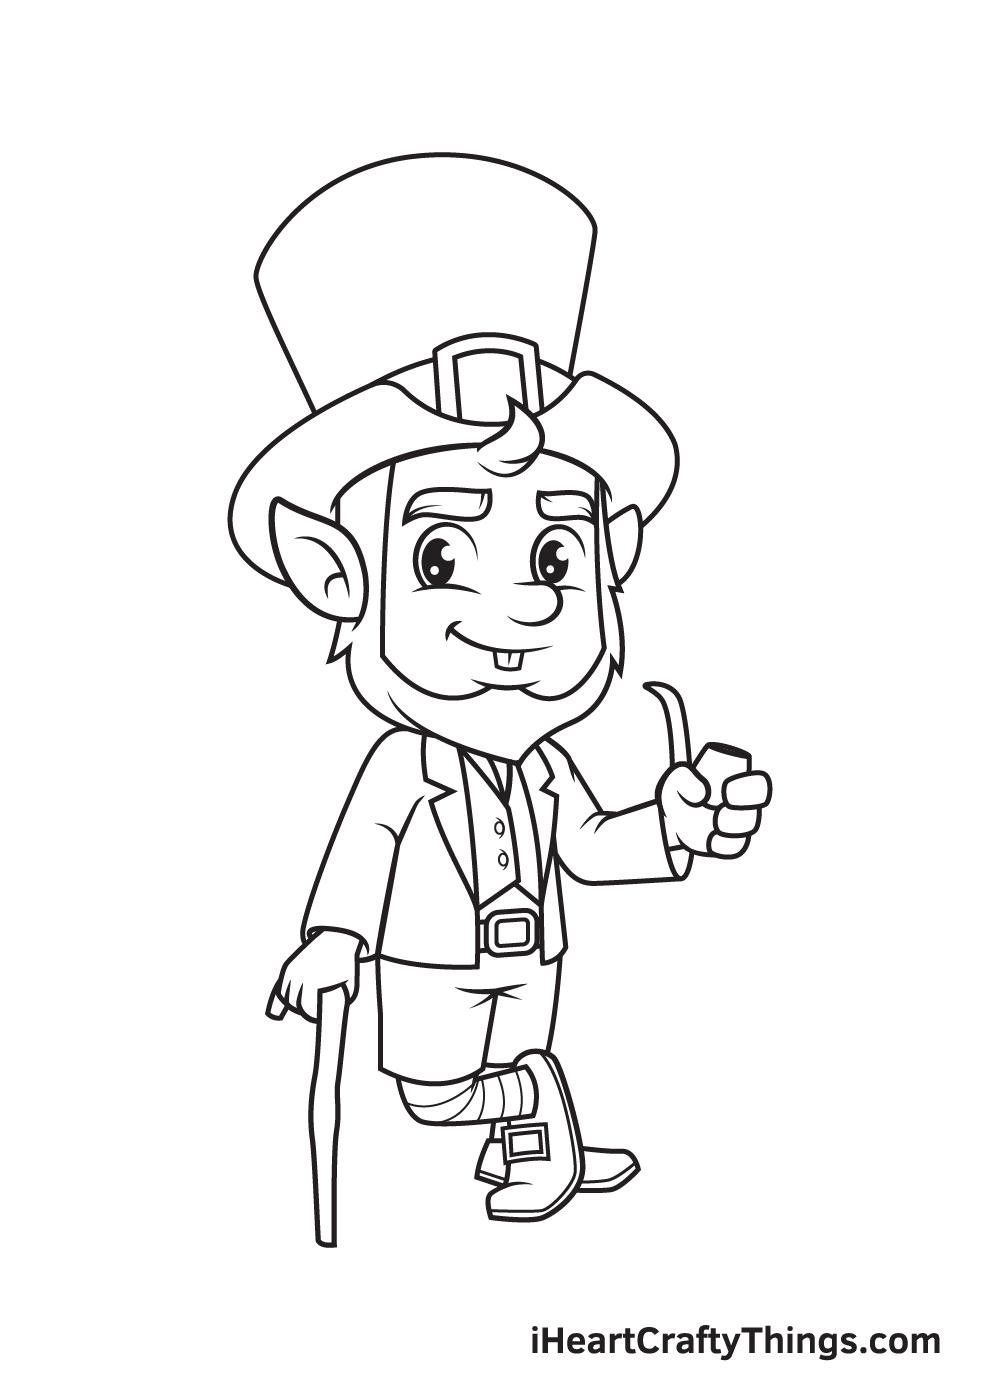 Leprechaun Drawing – Step 9